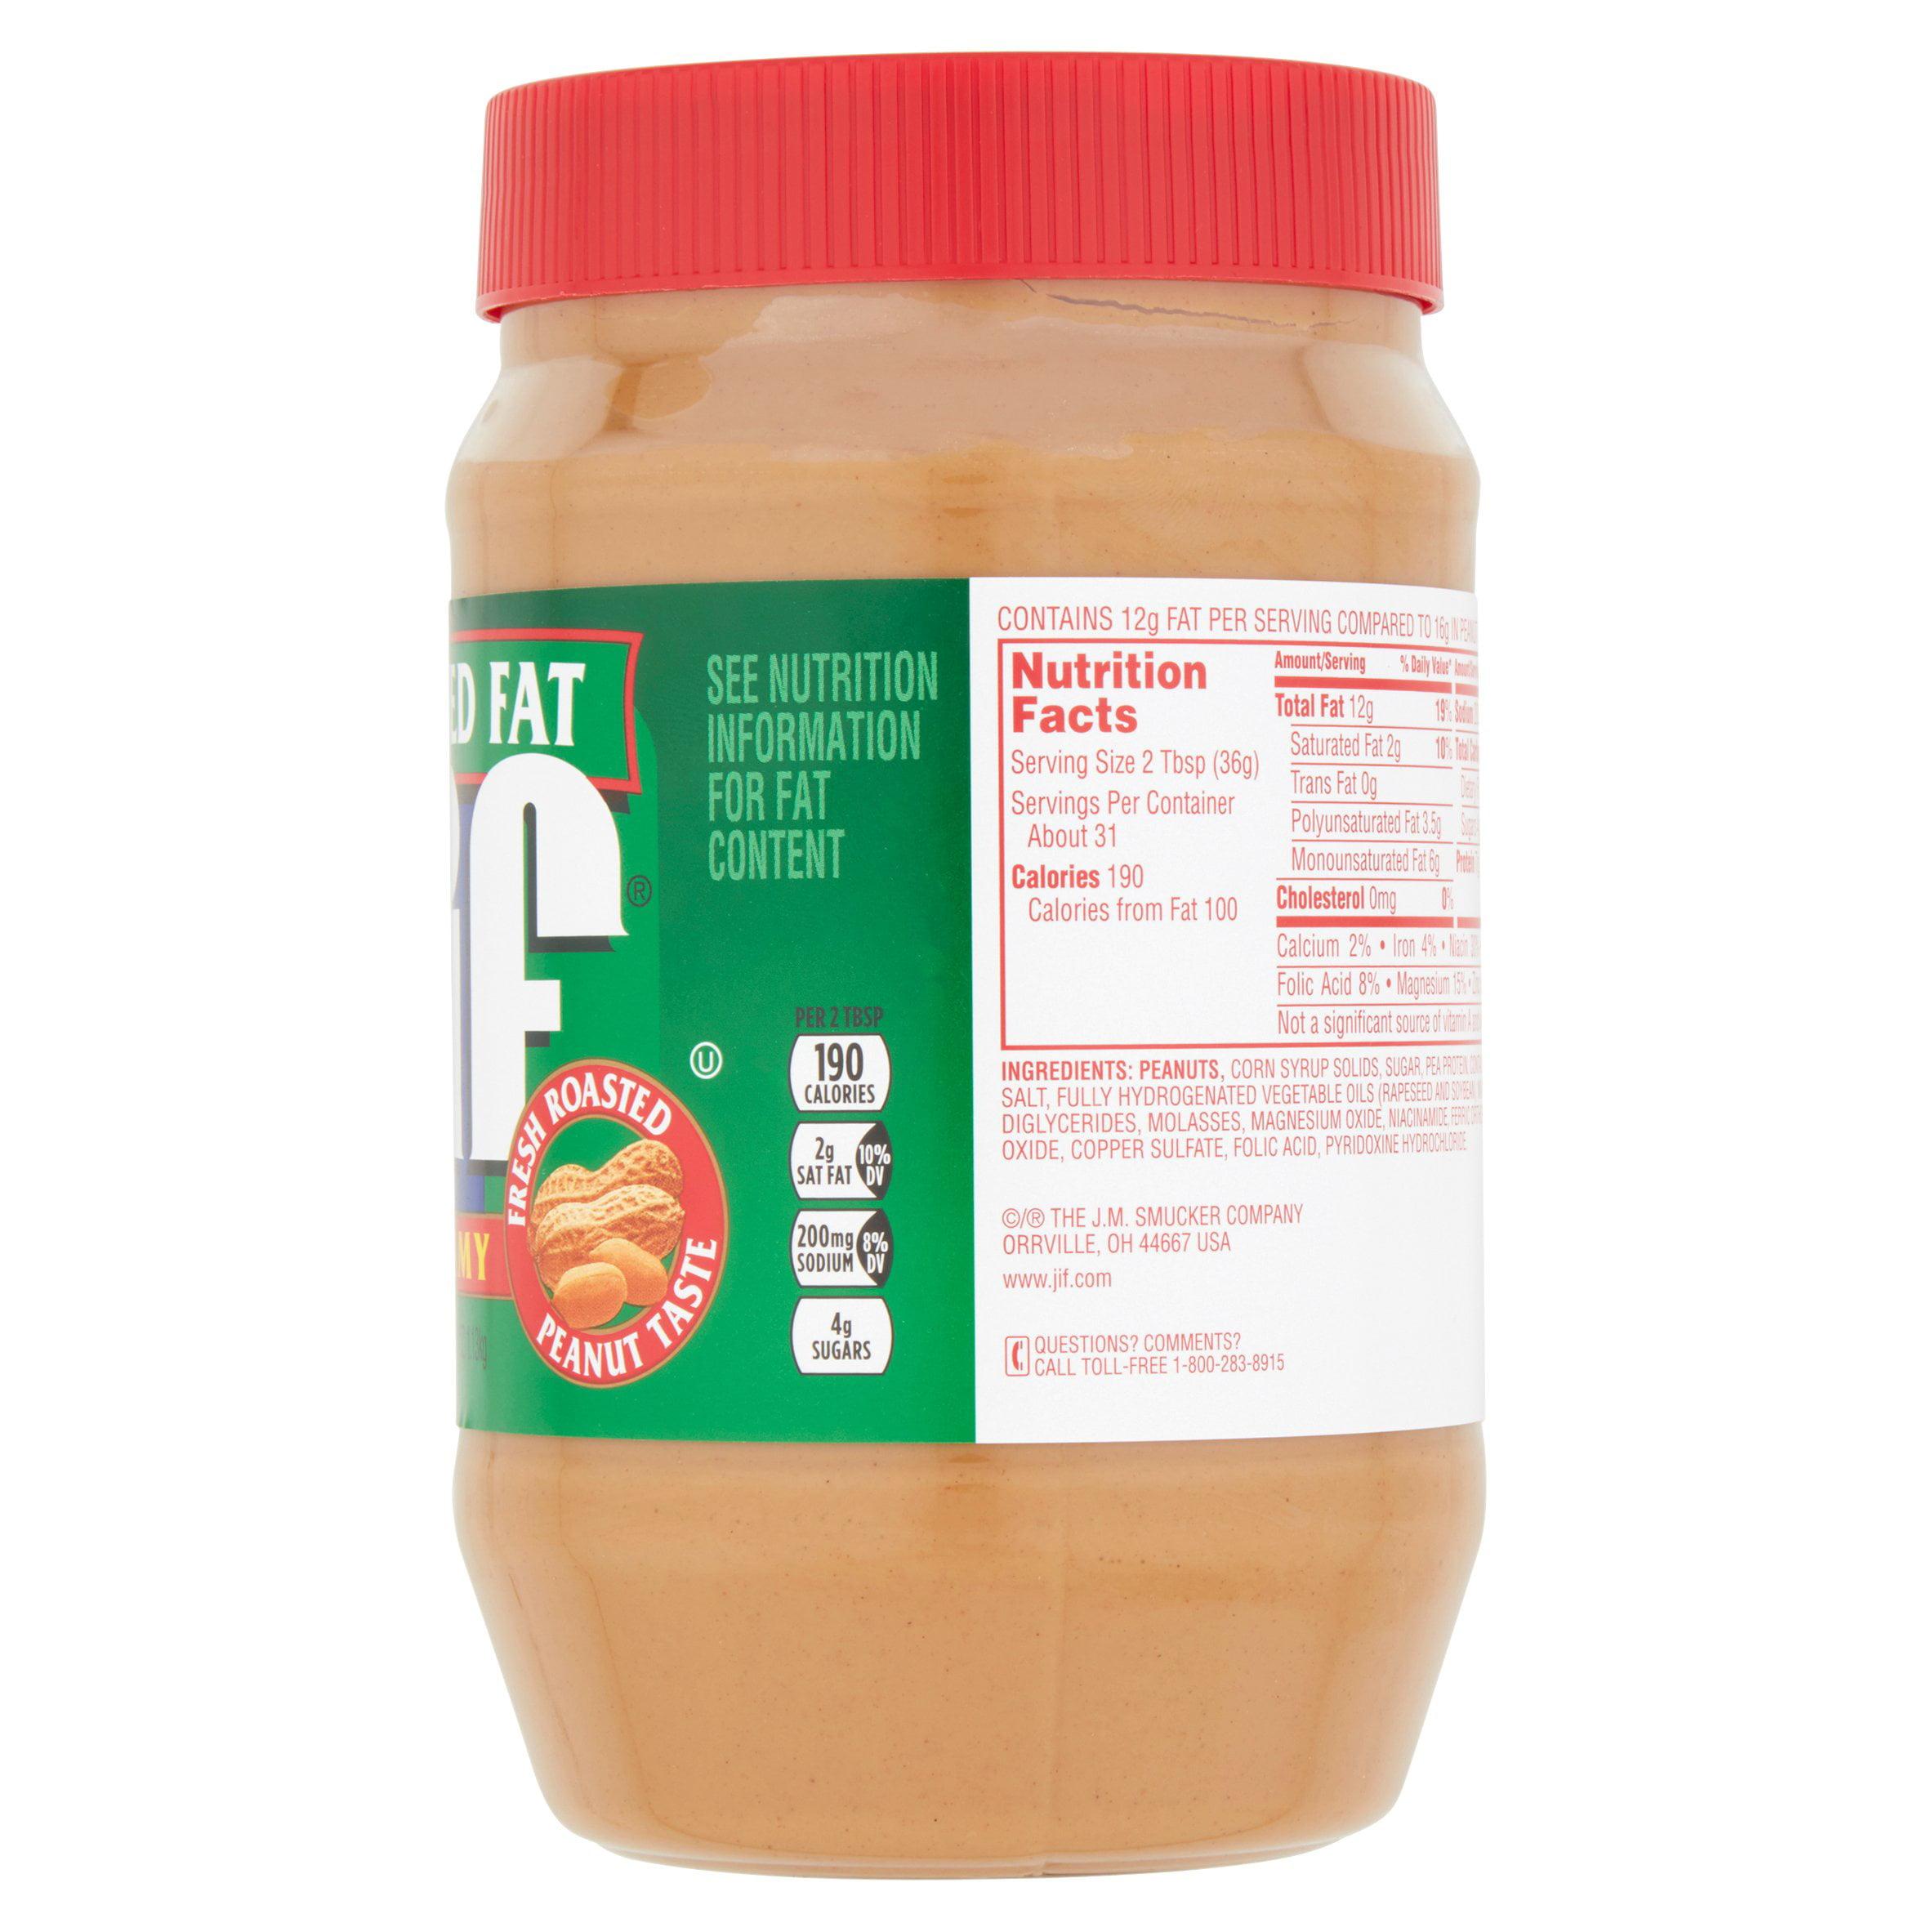 jif reduced fat creamy peanut butter, 40 oz - walmart